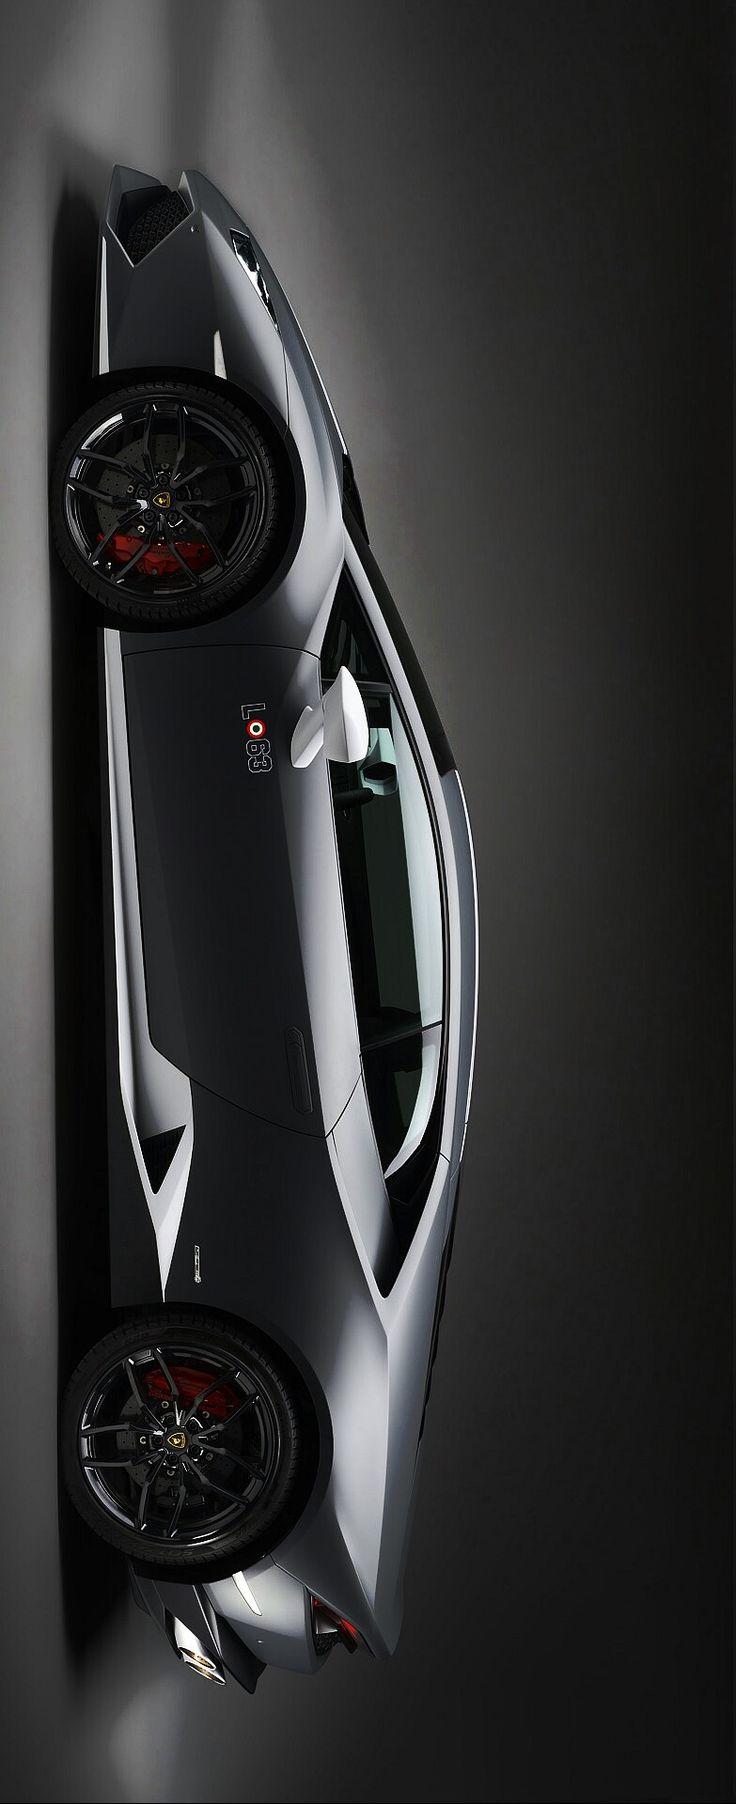 "(°!°) 2017 Lamborghini Huracan LP610-4 ""Aveo"" #2bitchn"